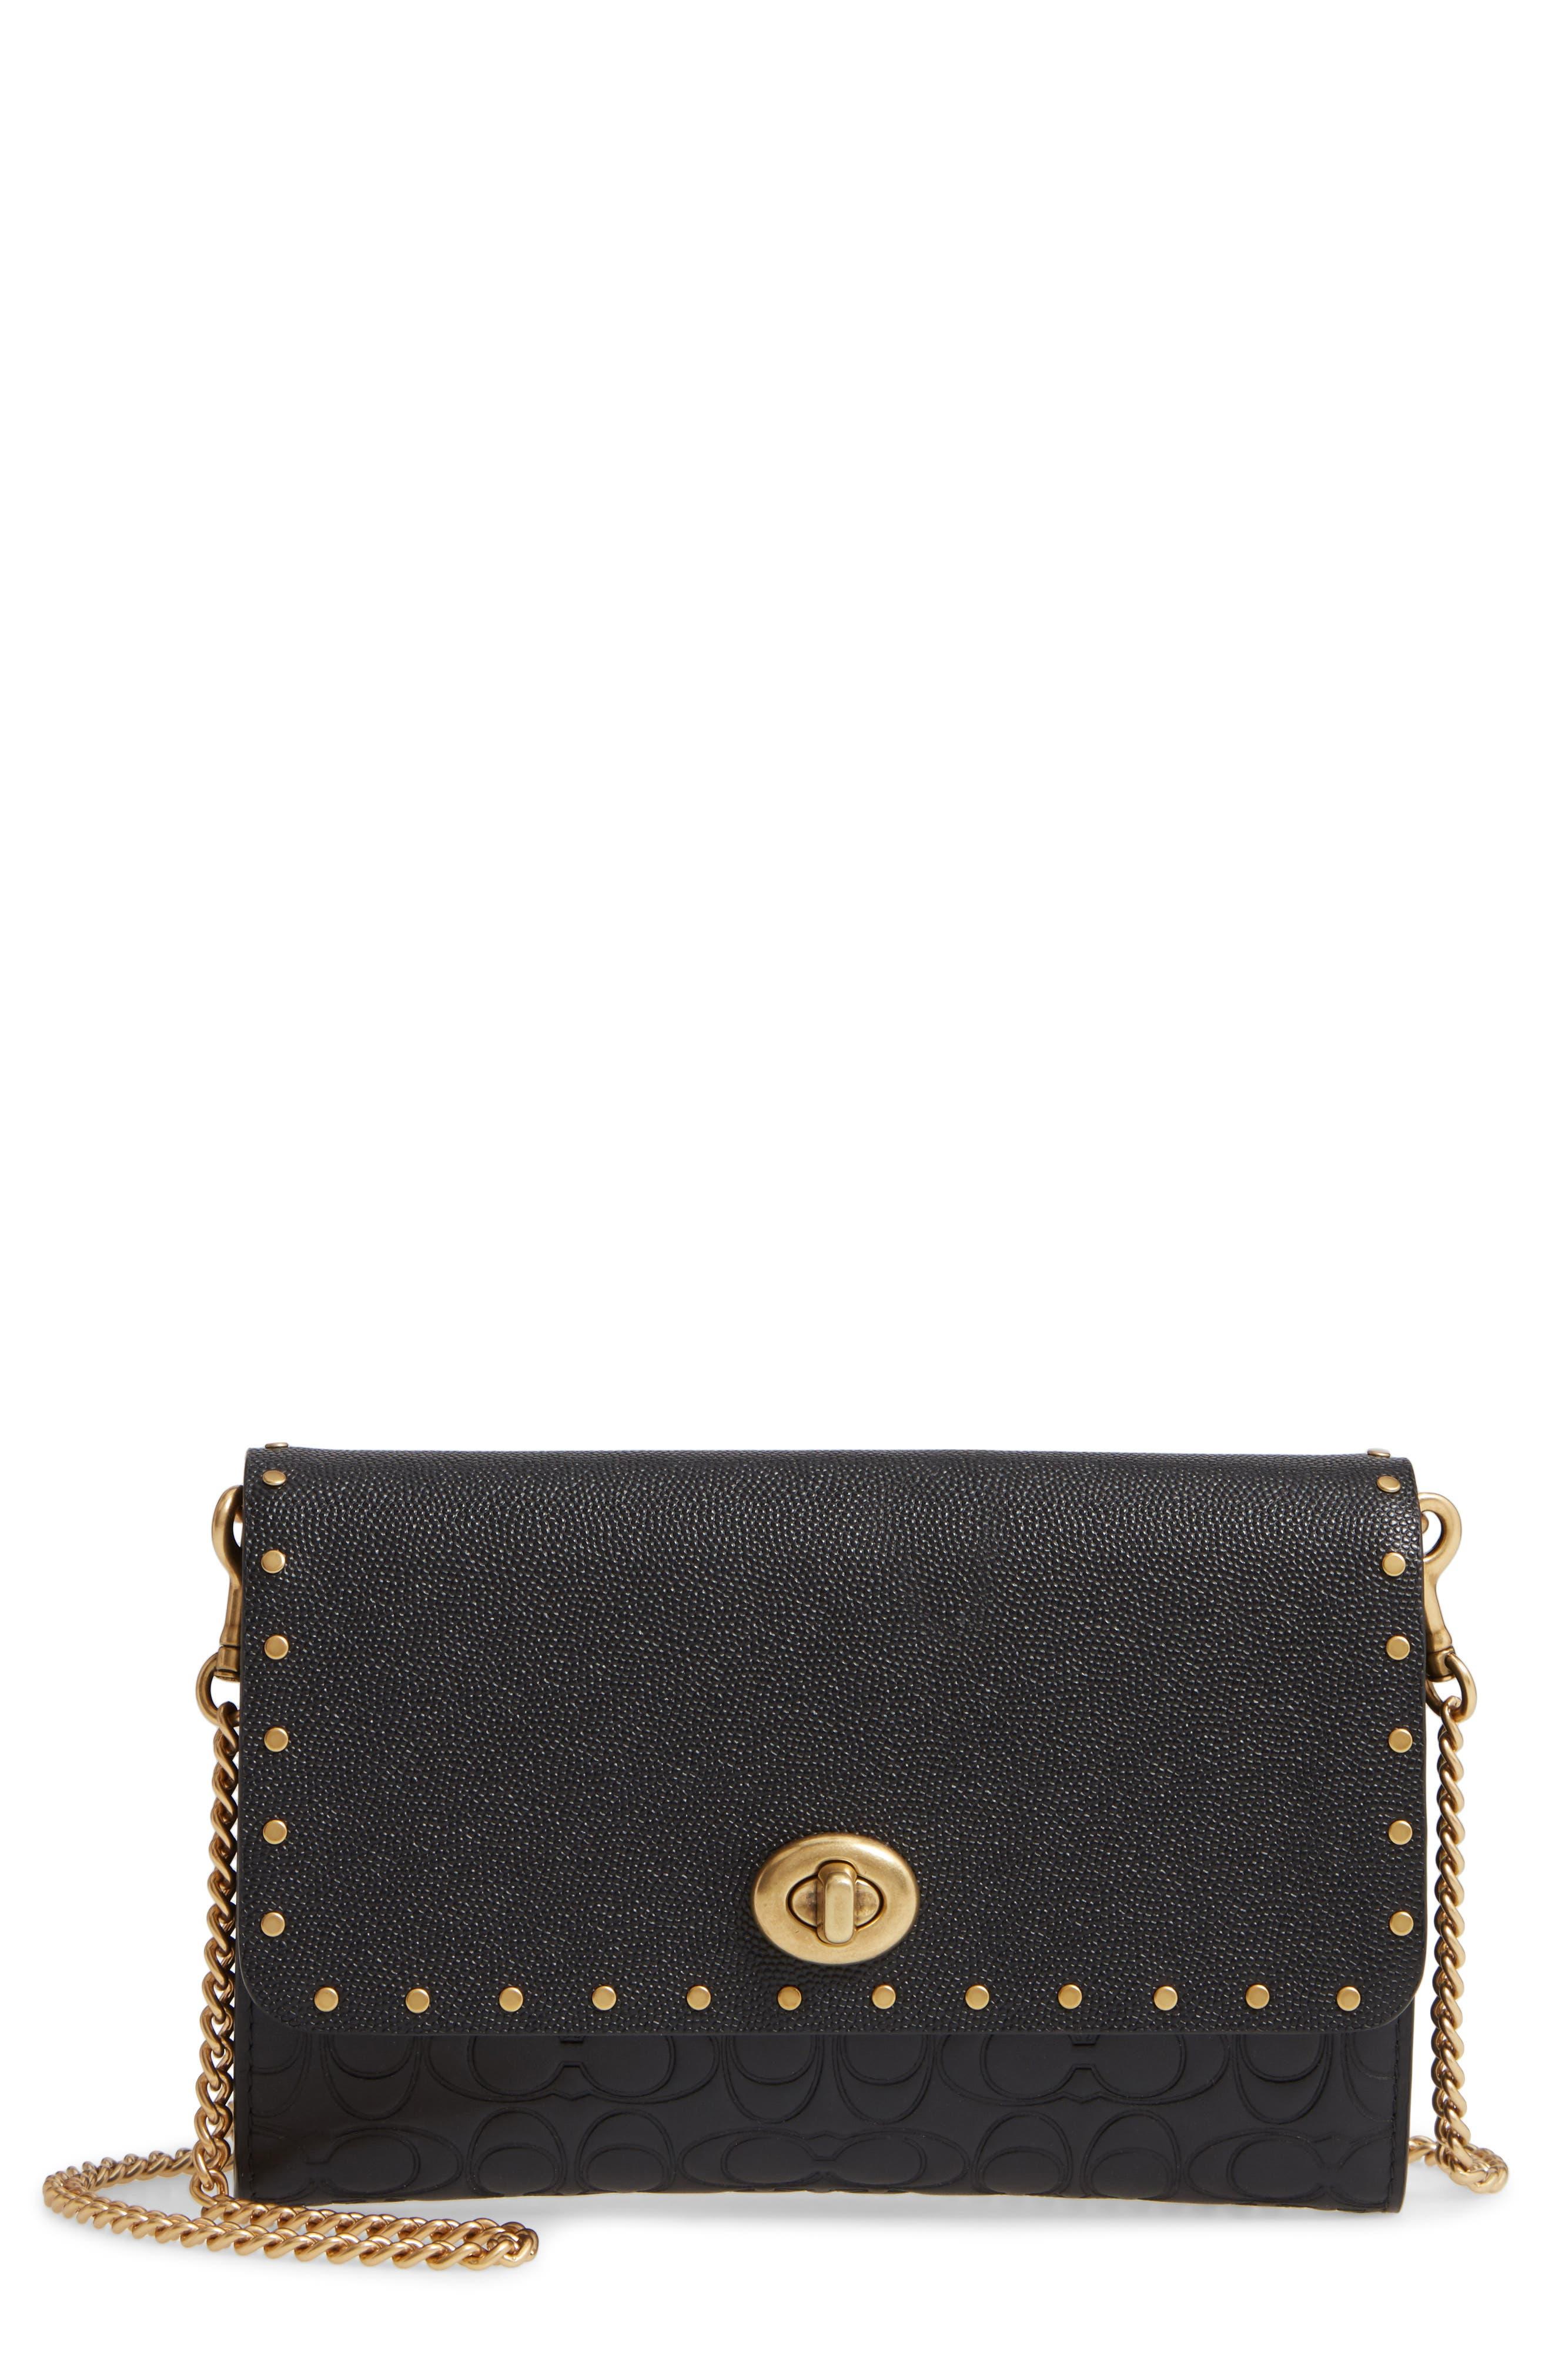 COACH, Marlow Rivets Leather Crossbody Bag, Main thumbnail 1, color, BLACK